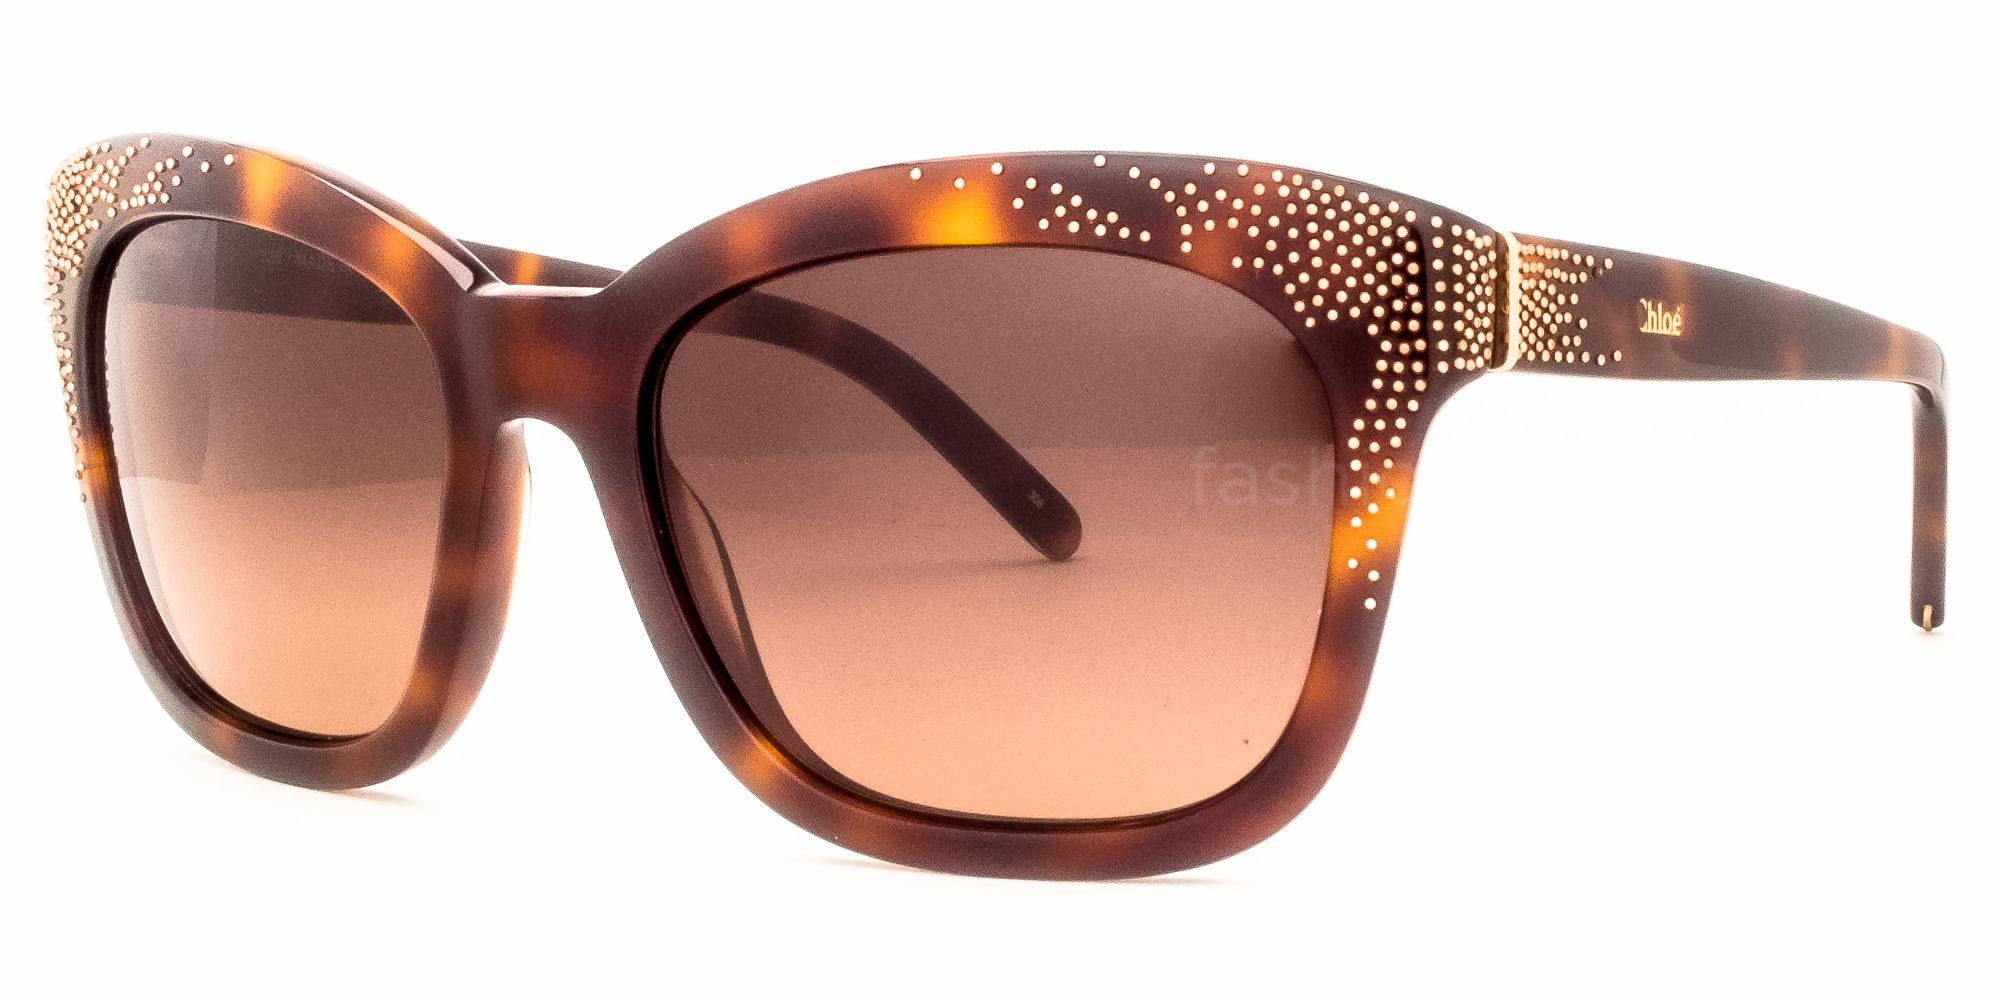 Chloe 626 sunglasses for Decor my eyes